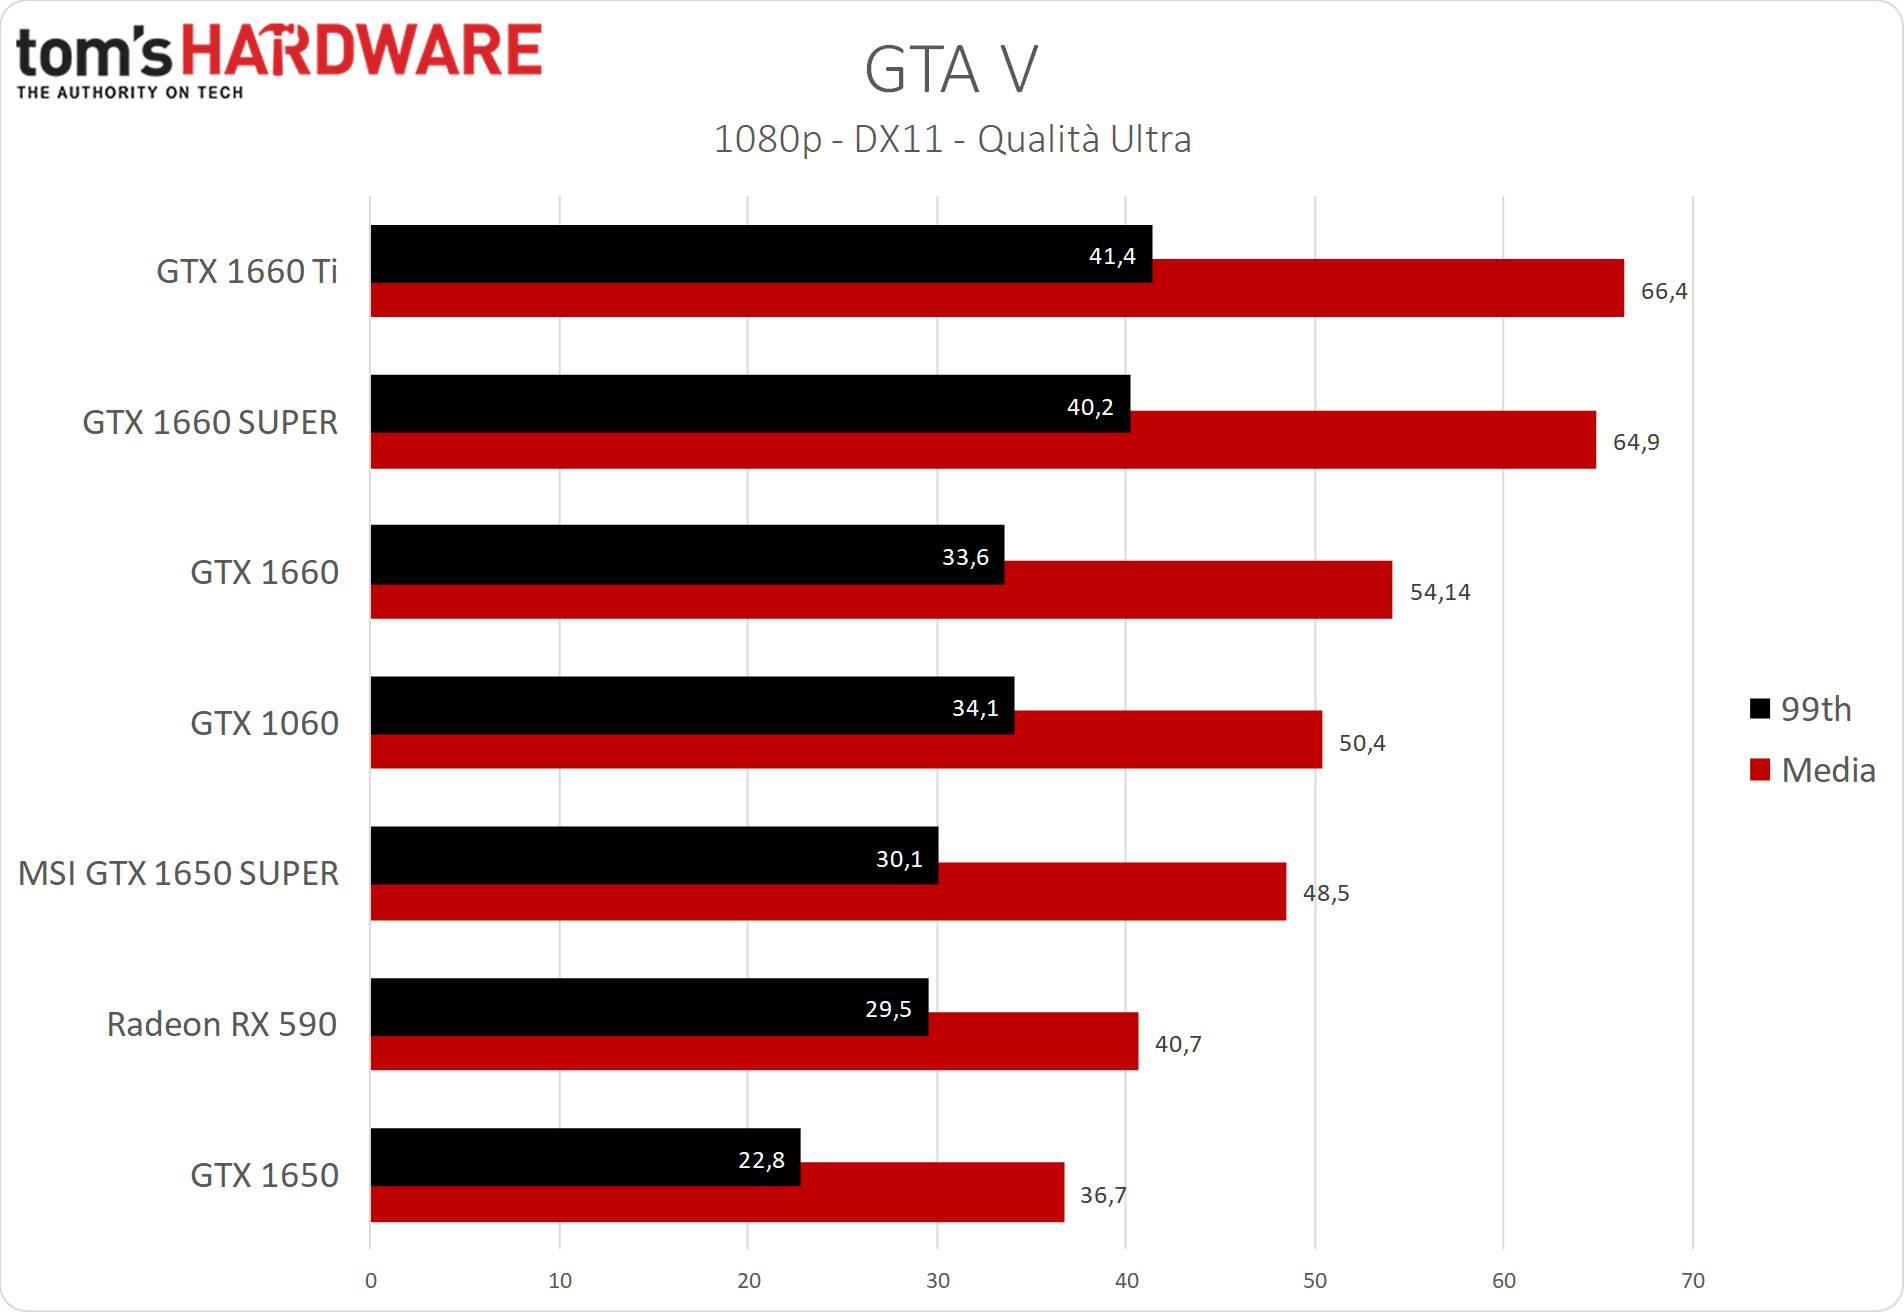 GeForce GTX 1650 SUPER GTA V